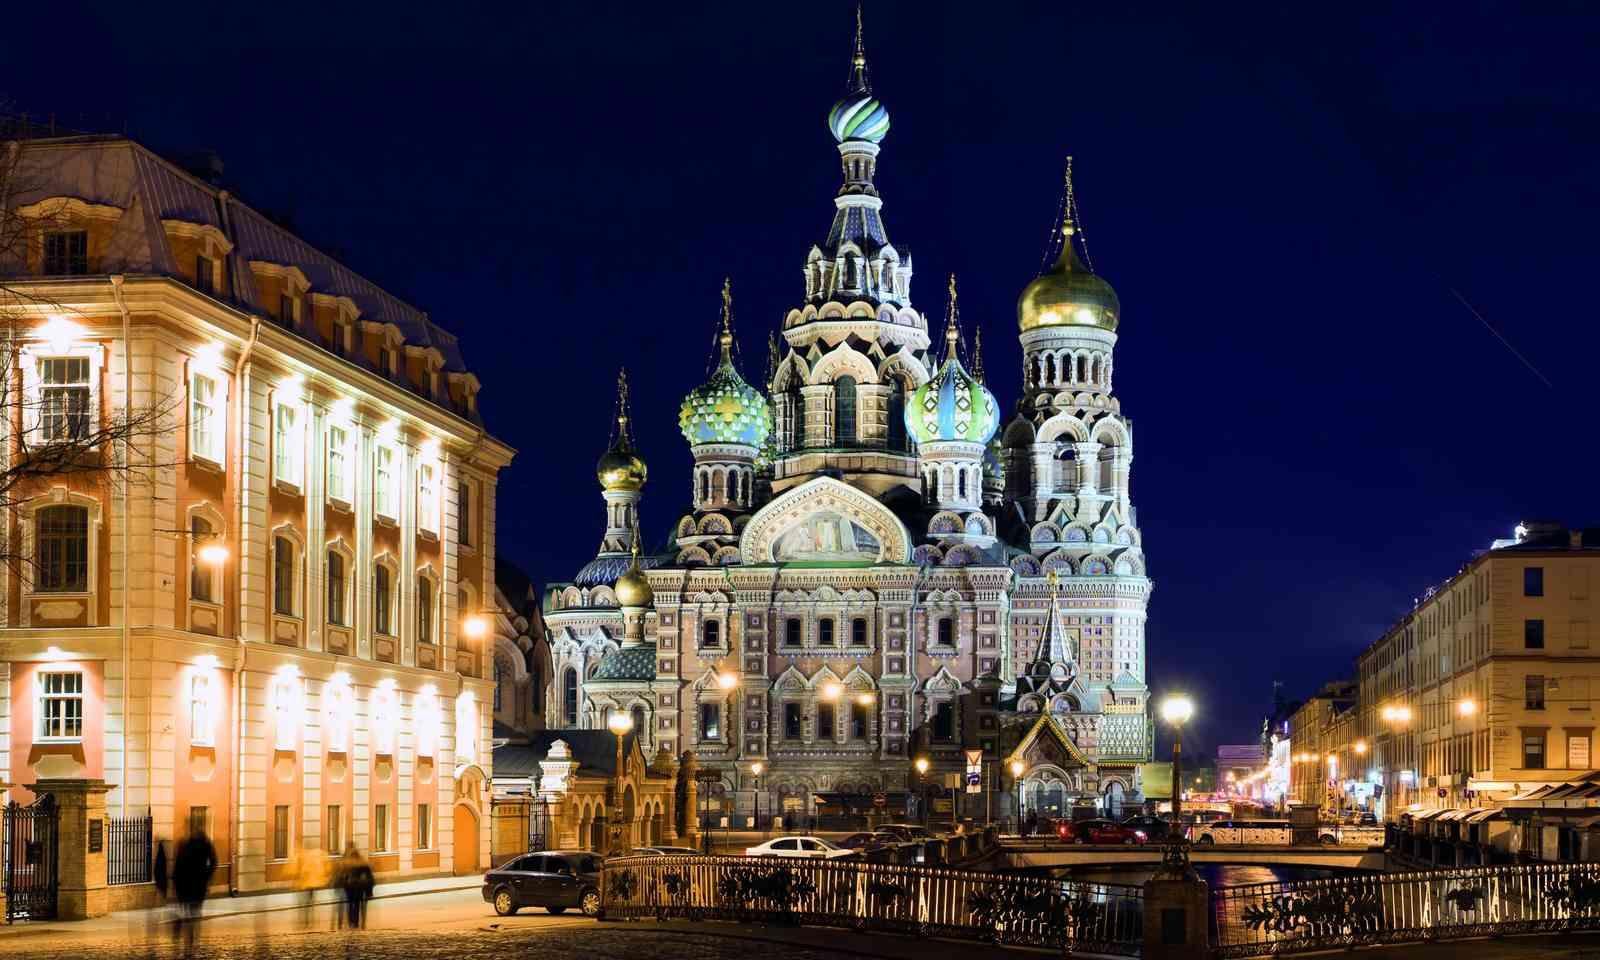 St Petersburg by night (Shutterstock.com)